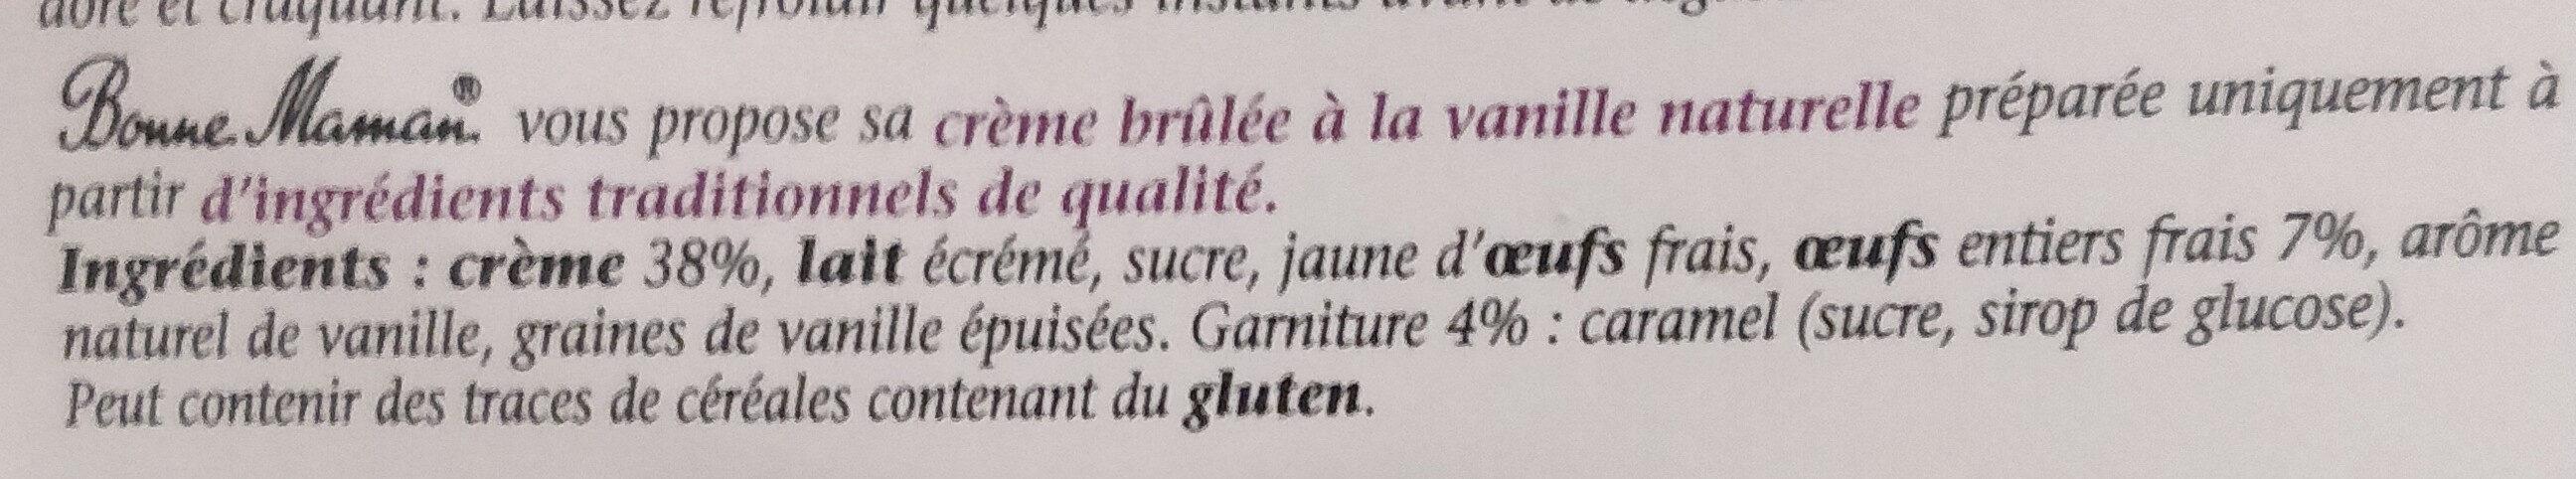 Crème brûlée aux œufs frais - Ingrediënten - fr